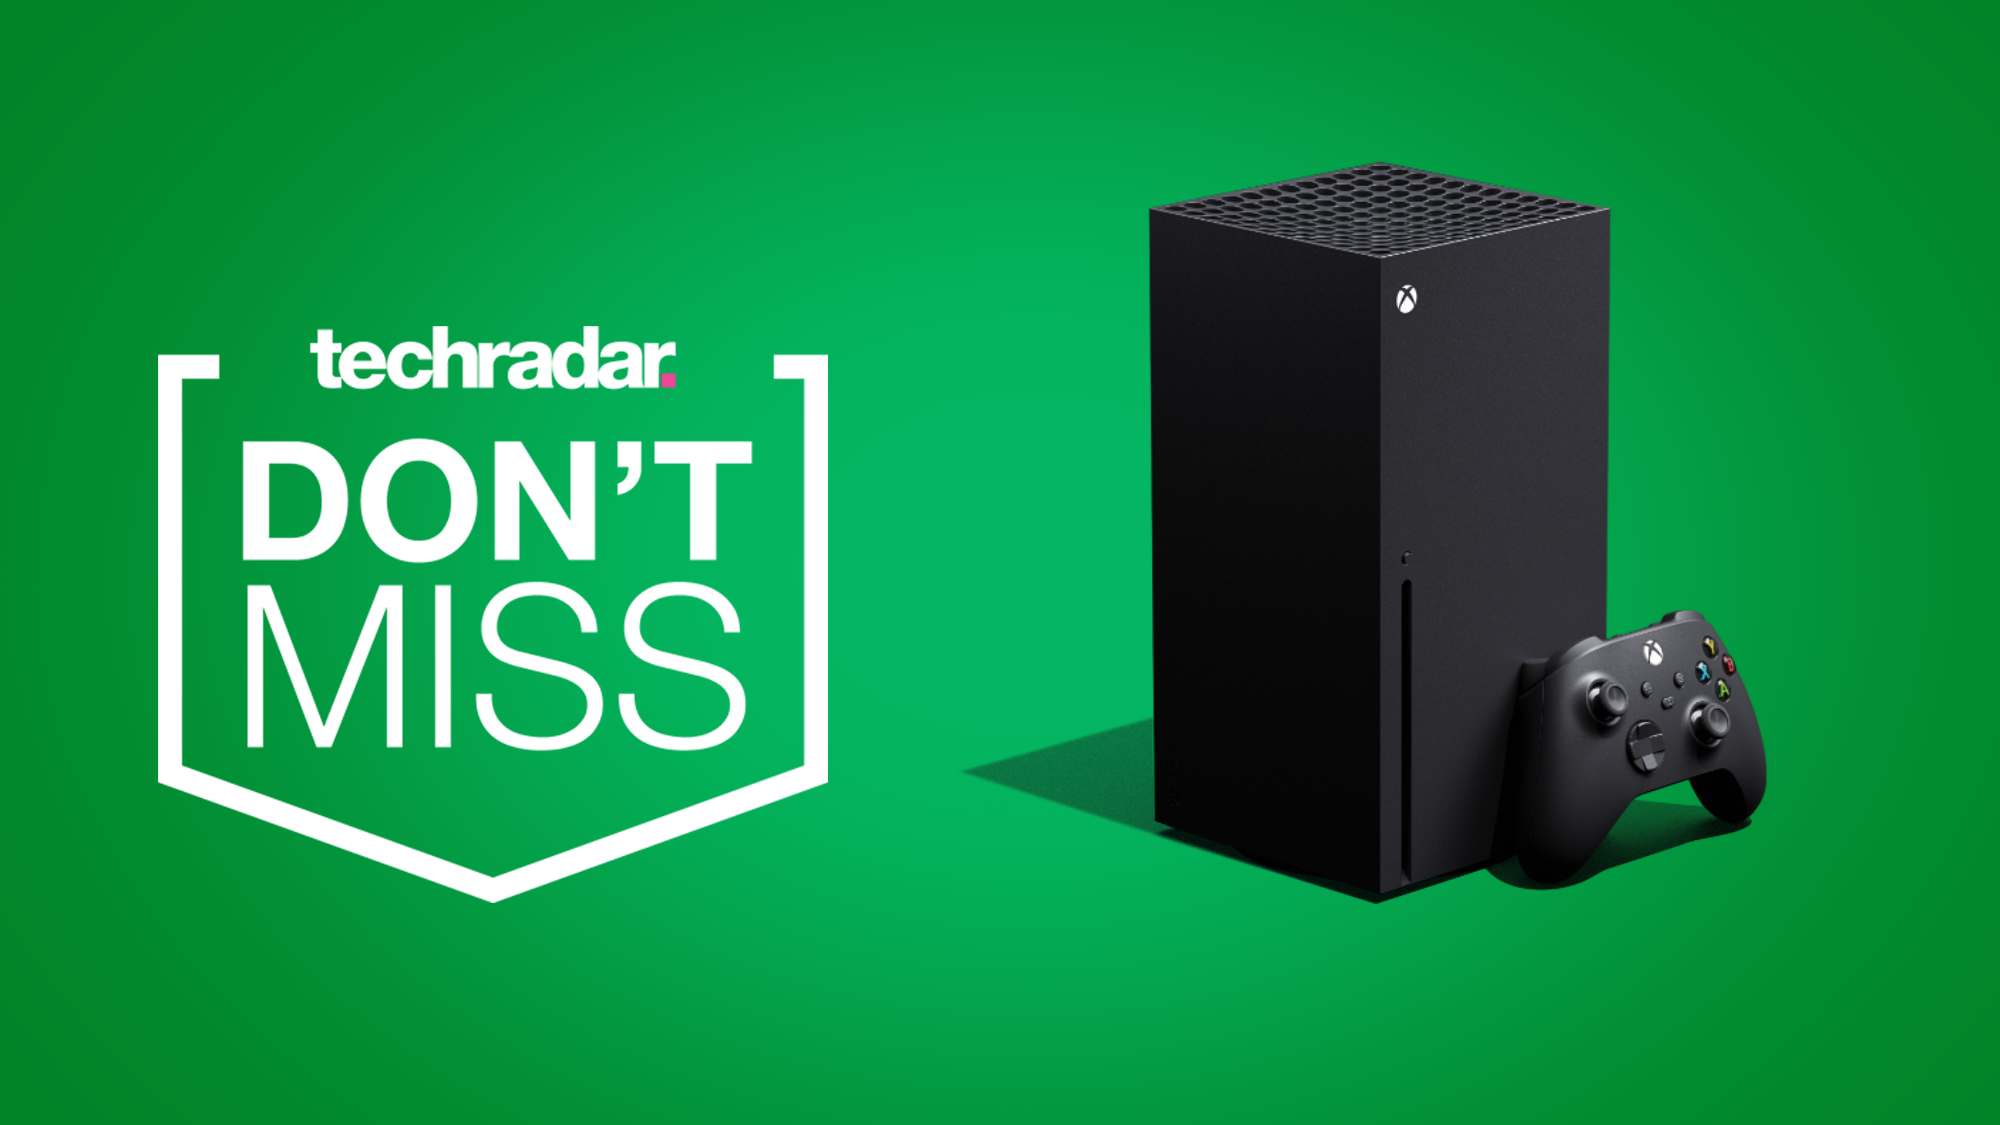 xbox-series-x-restock:-best-buy-has-it-in-stock-–-how-to-buy-it-online-right-now